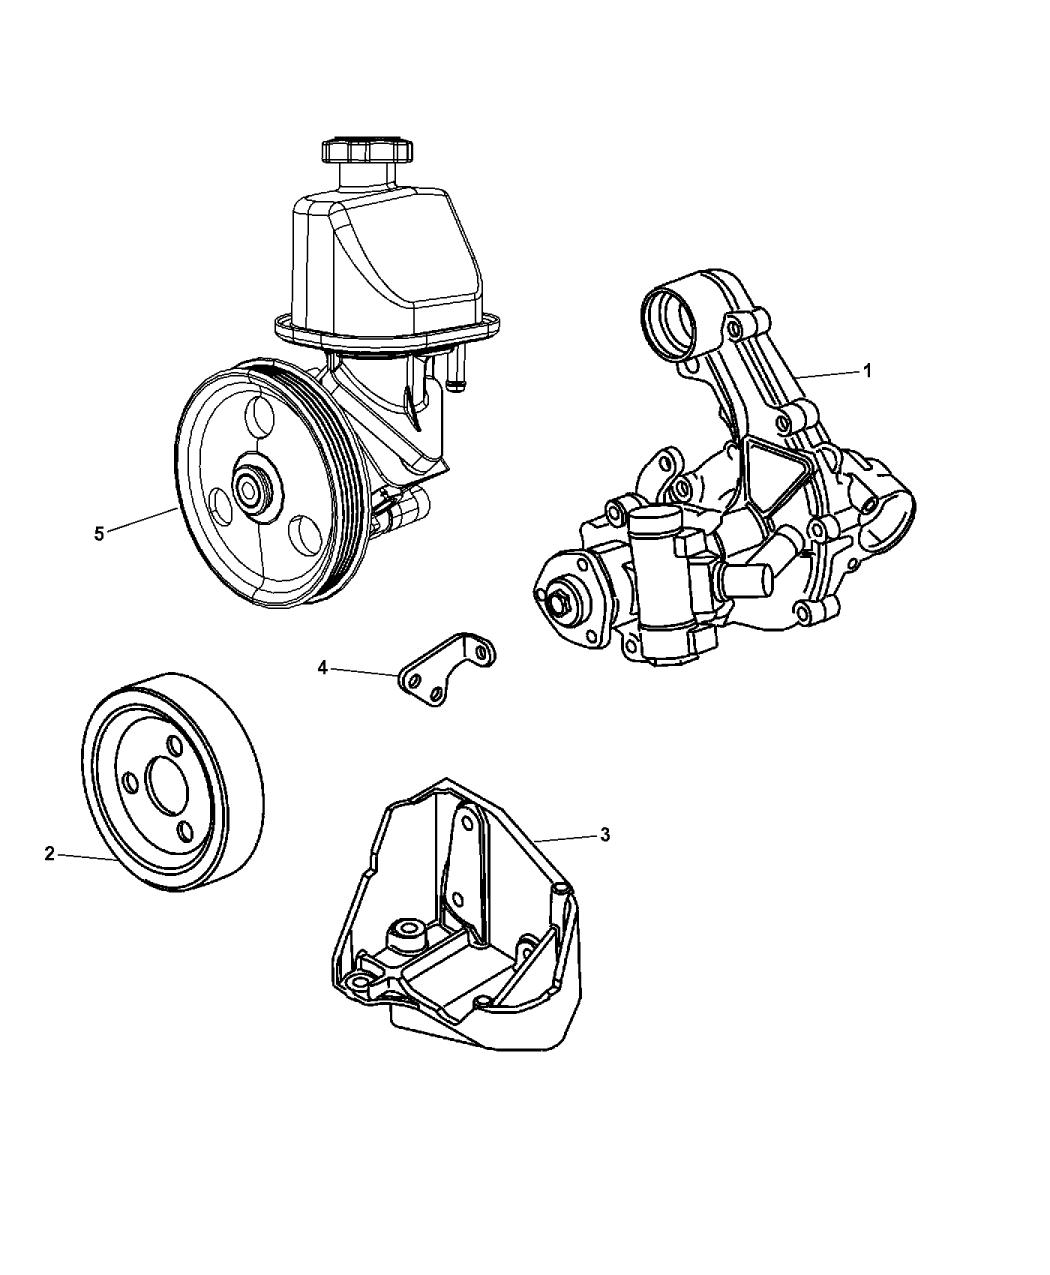 2008 Chrysler PT Cruiser Power Steering Pump - Mopar Parts ...